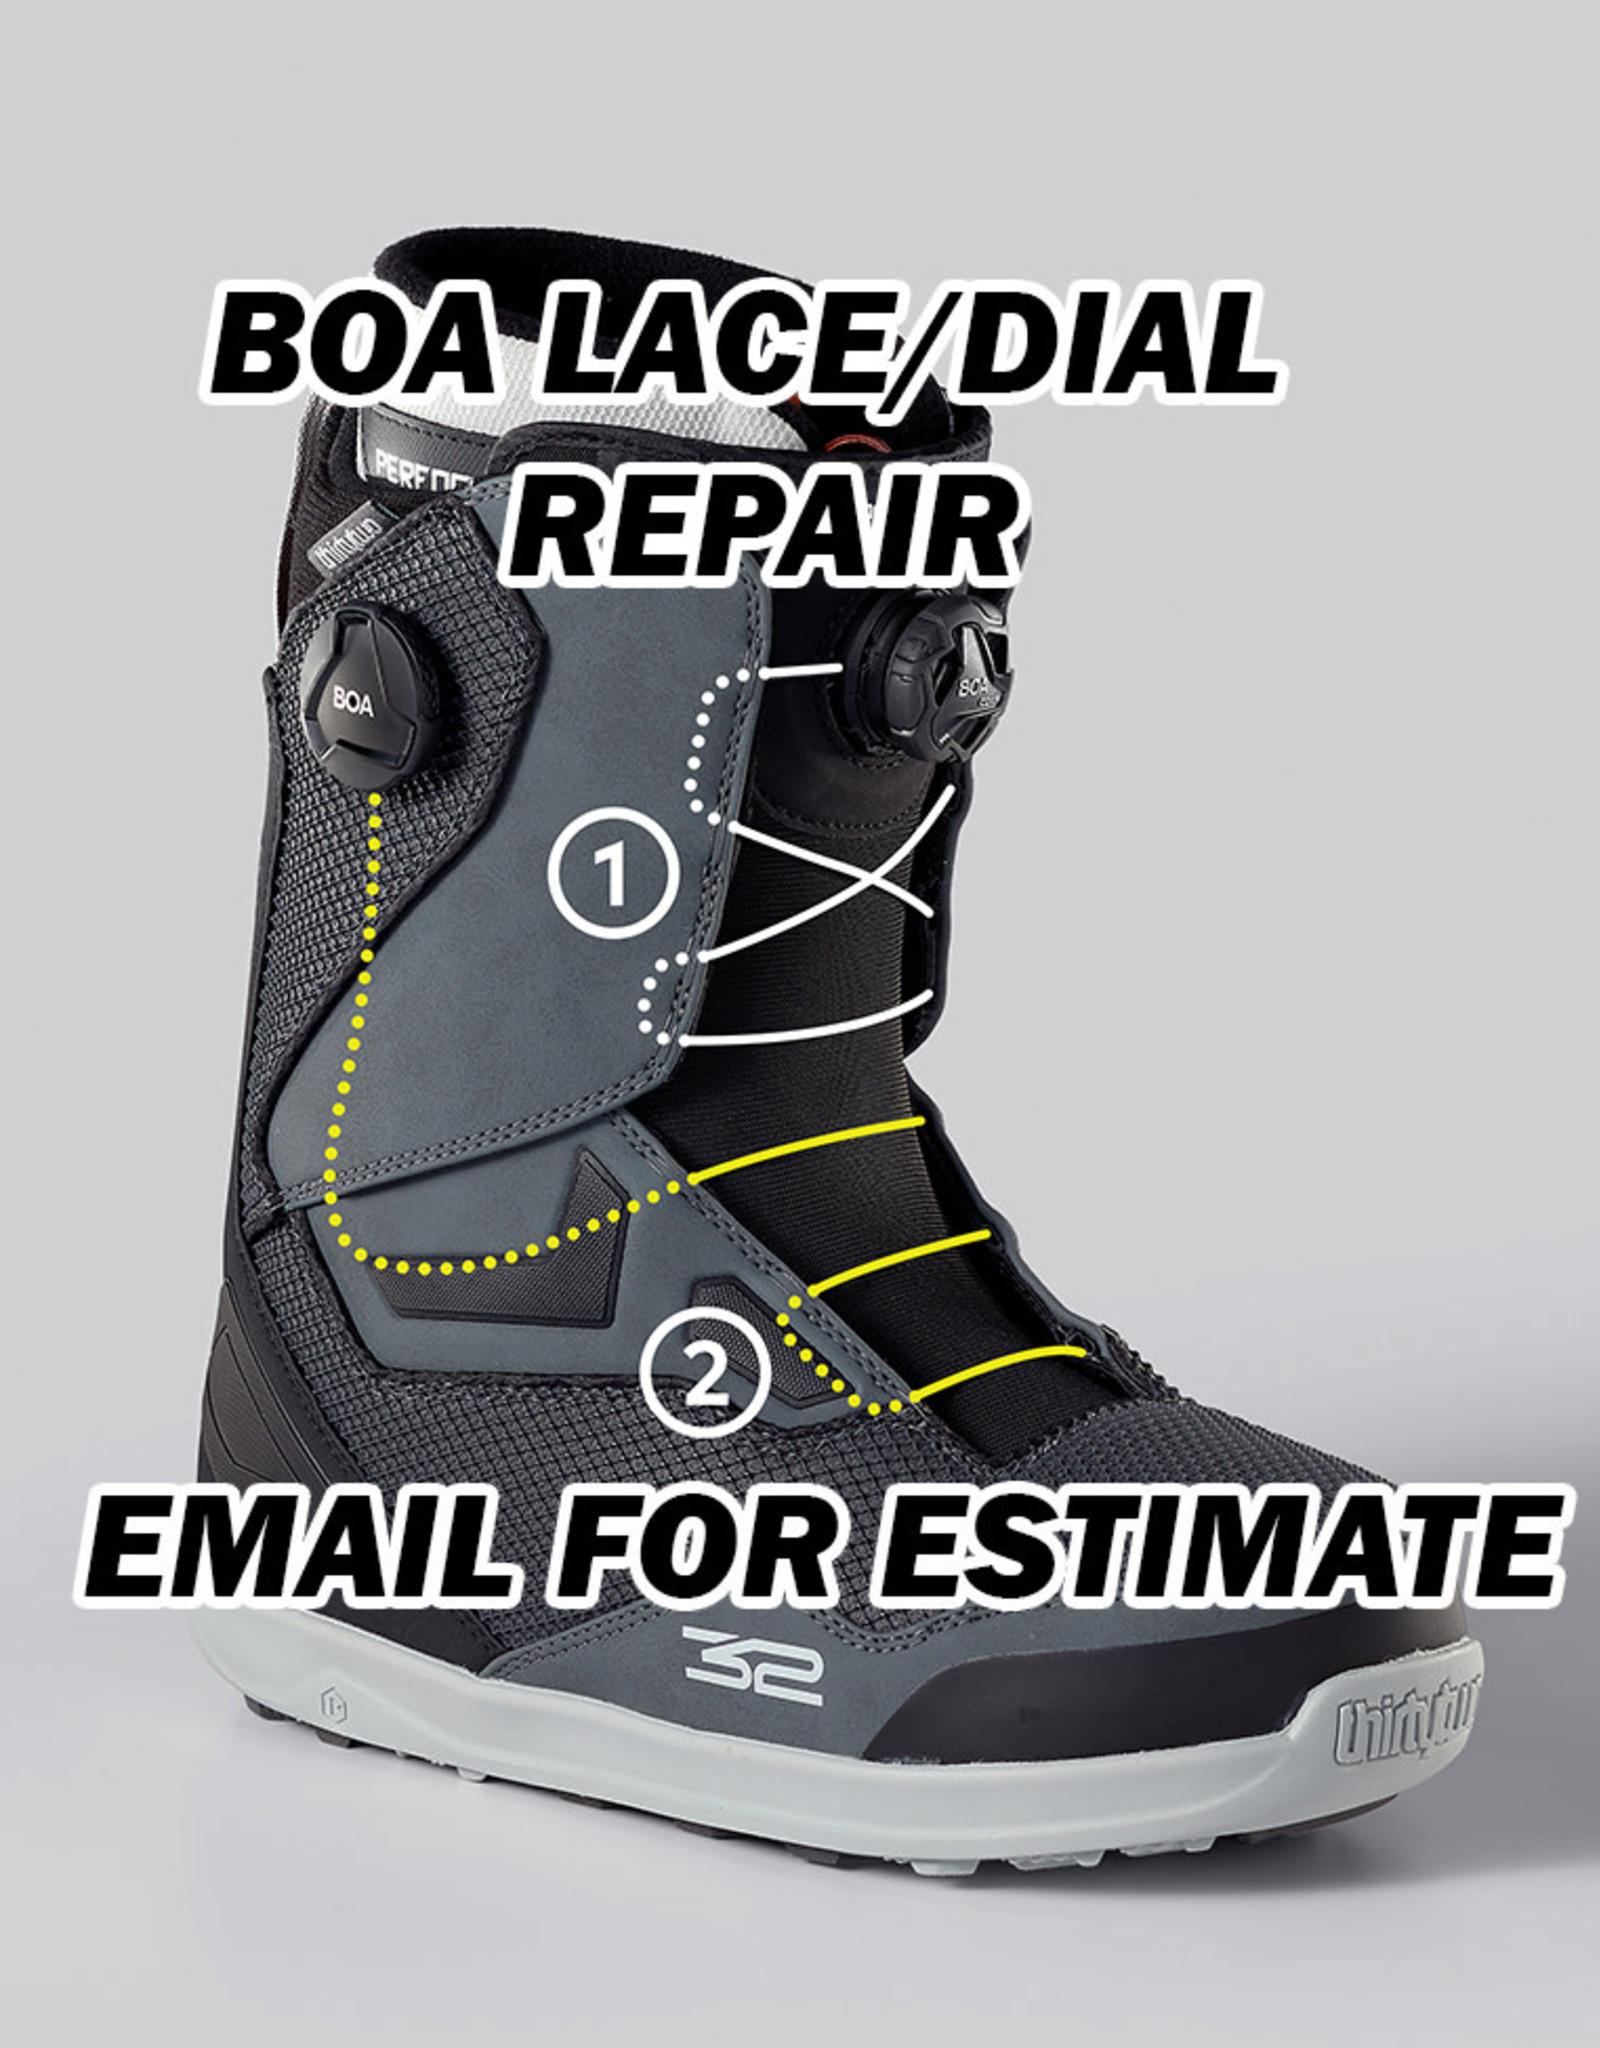 Syndicate BOA LACE / DIAL REPAIR